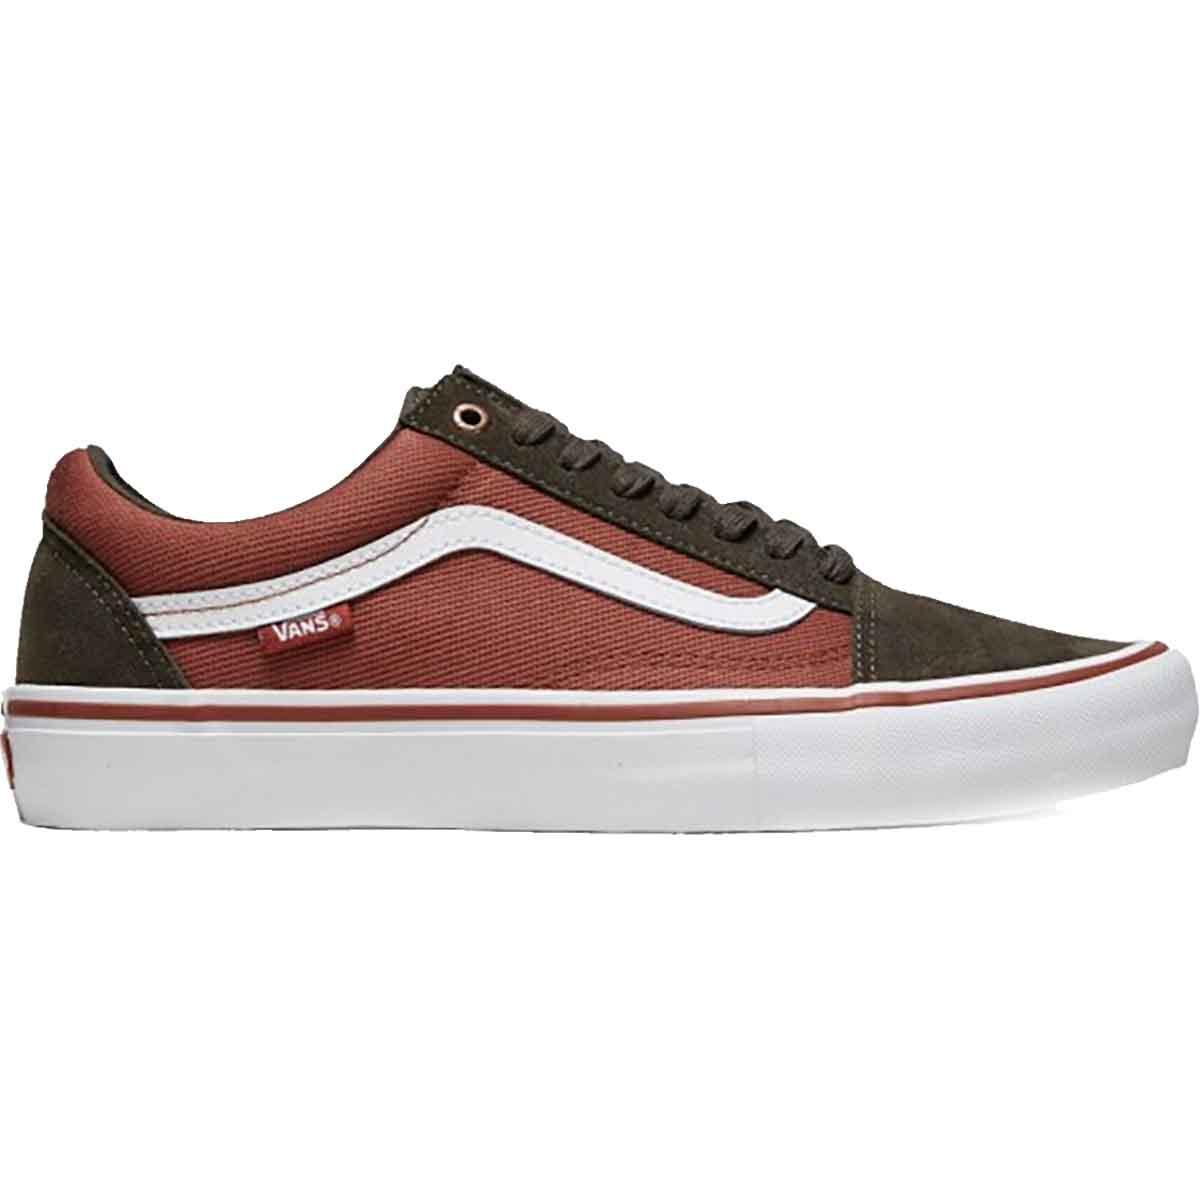 Vans Old Skool Pro Shoes - Heavy Twill